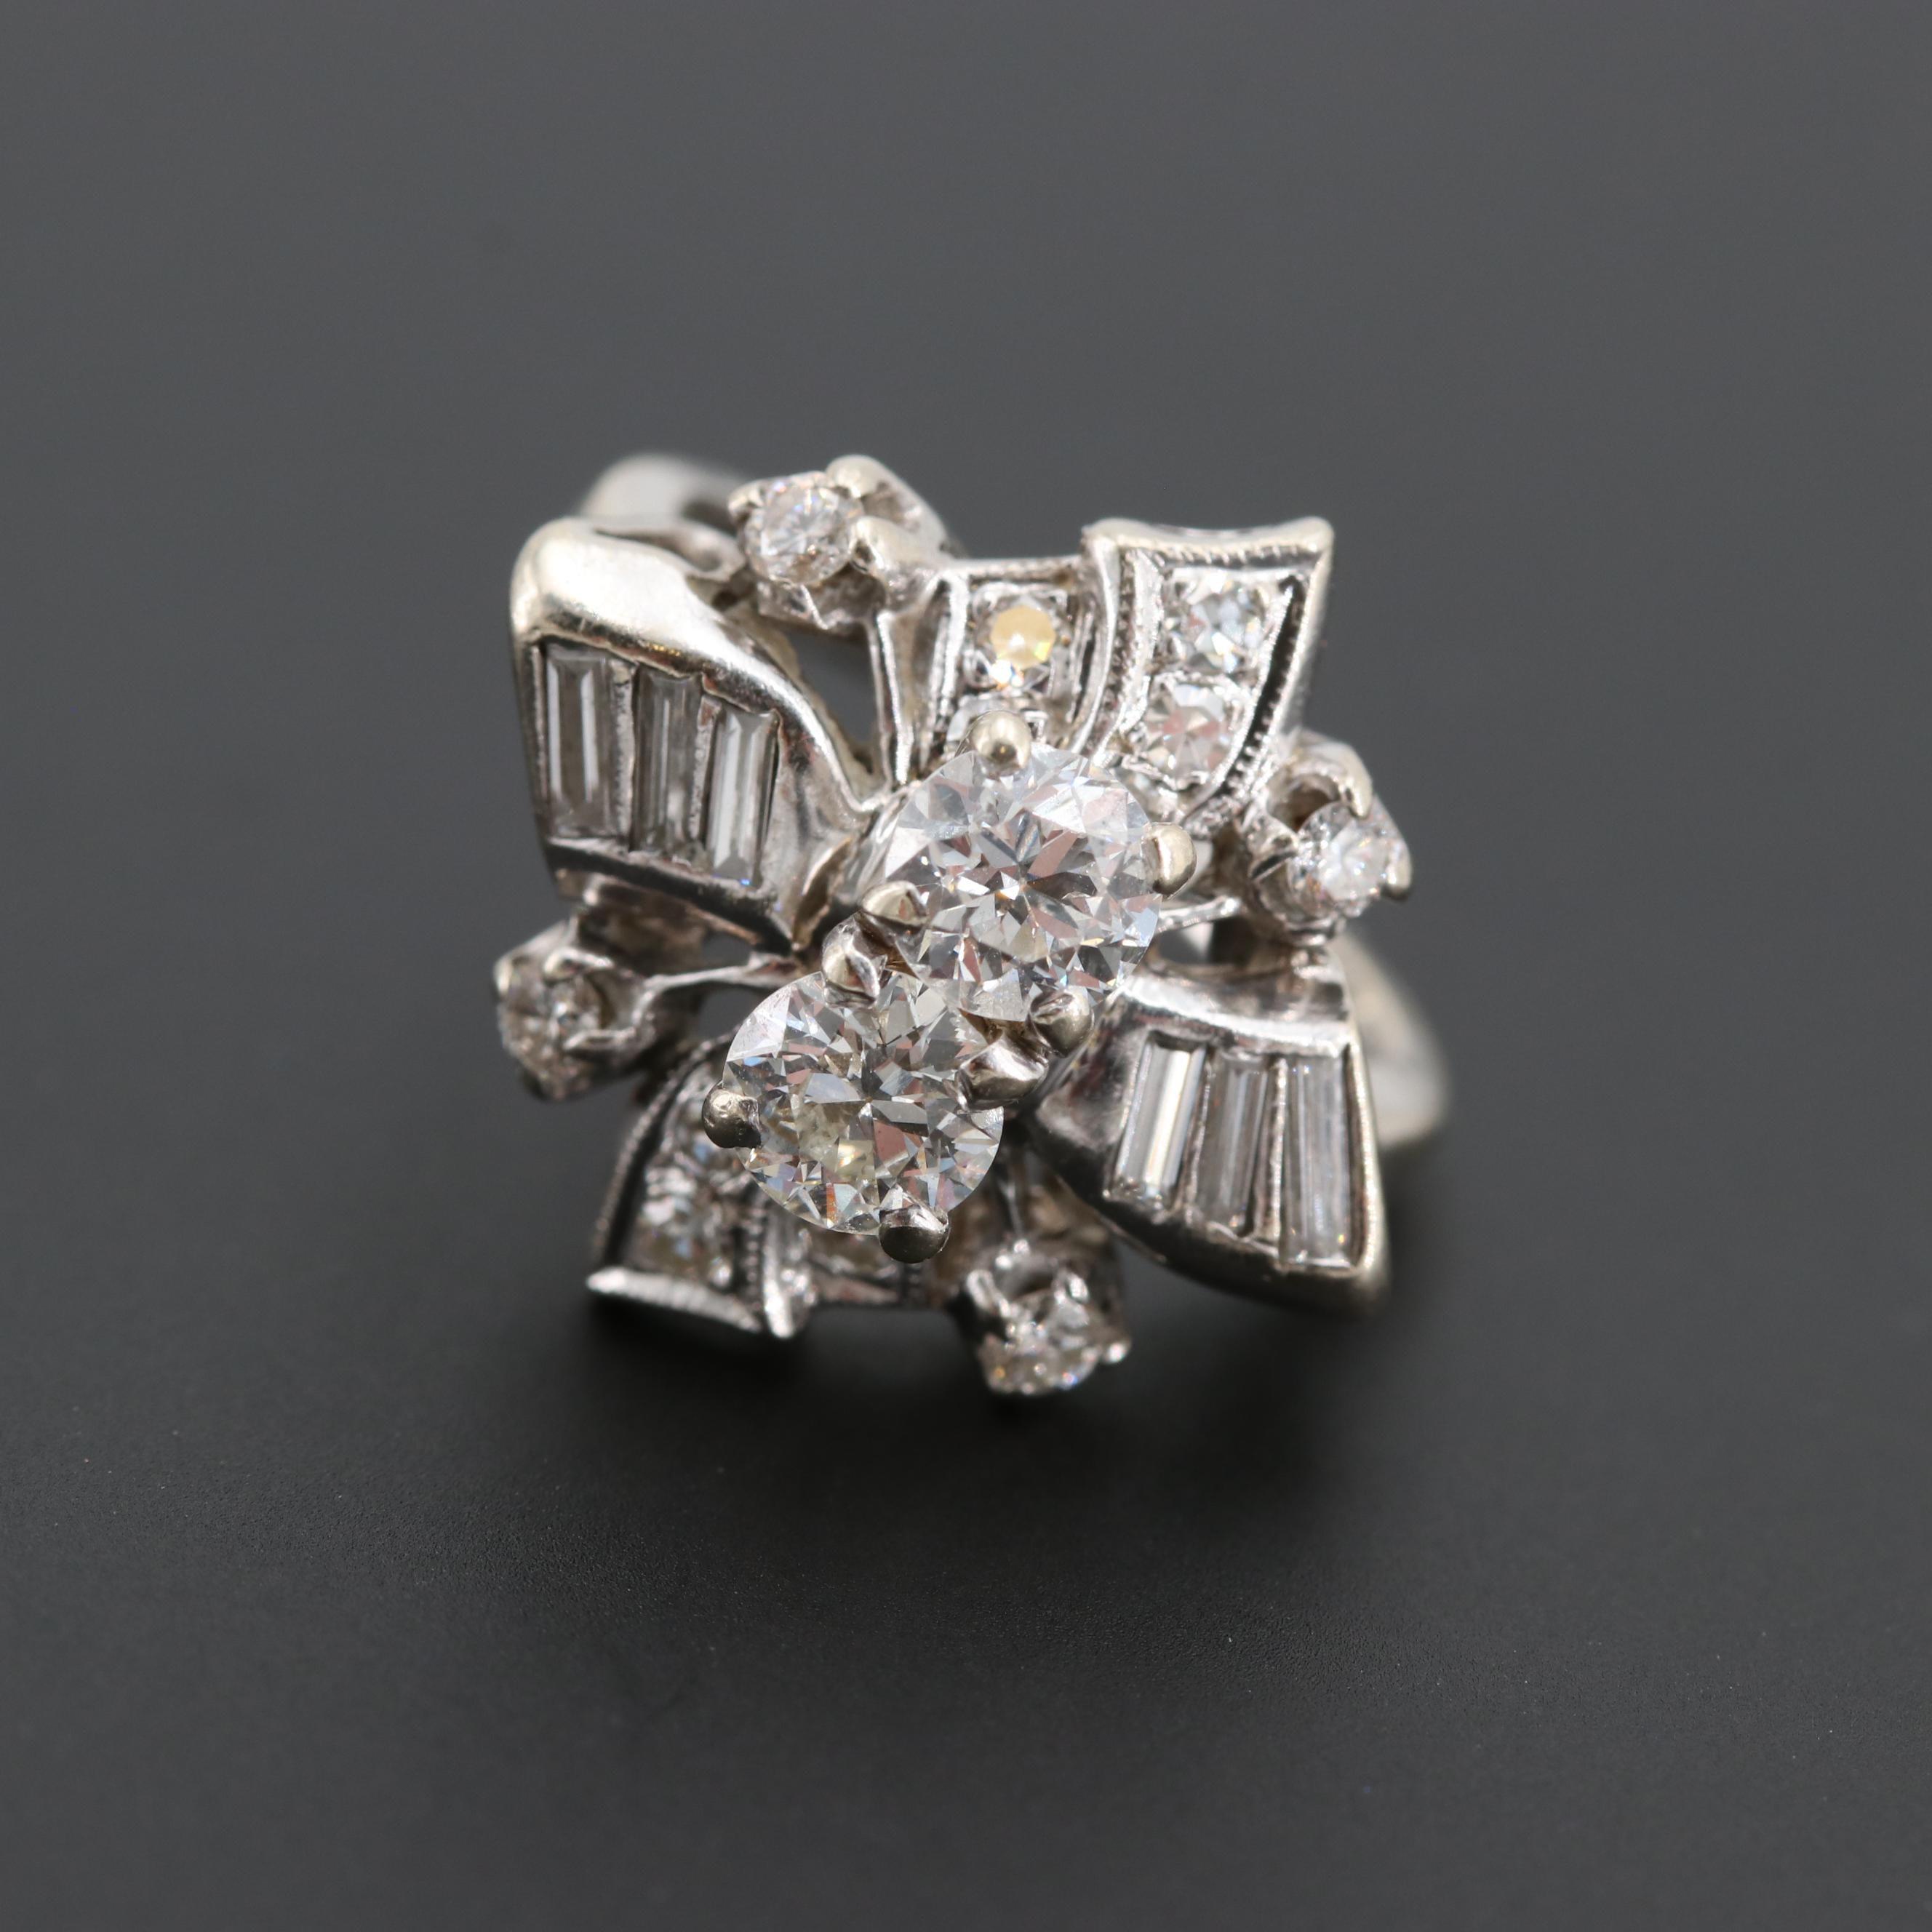 Vintage 14K White Gold 1.30 CTW Diamond Ring